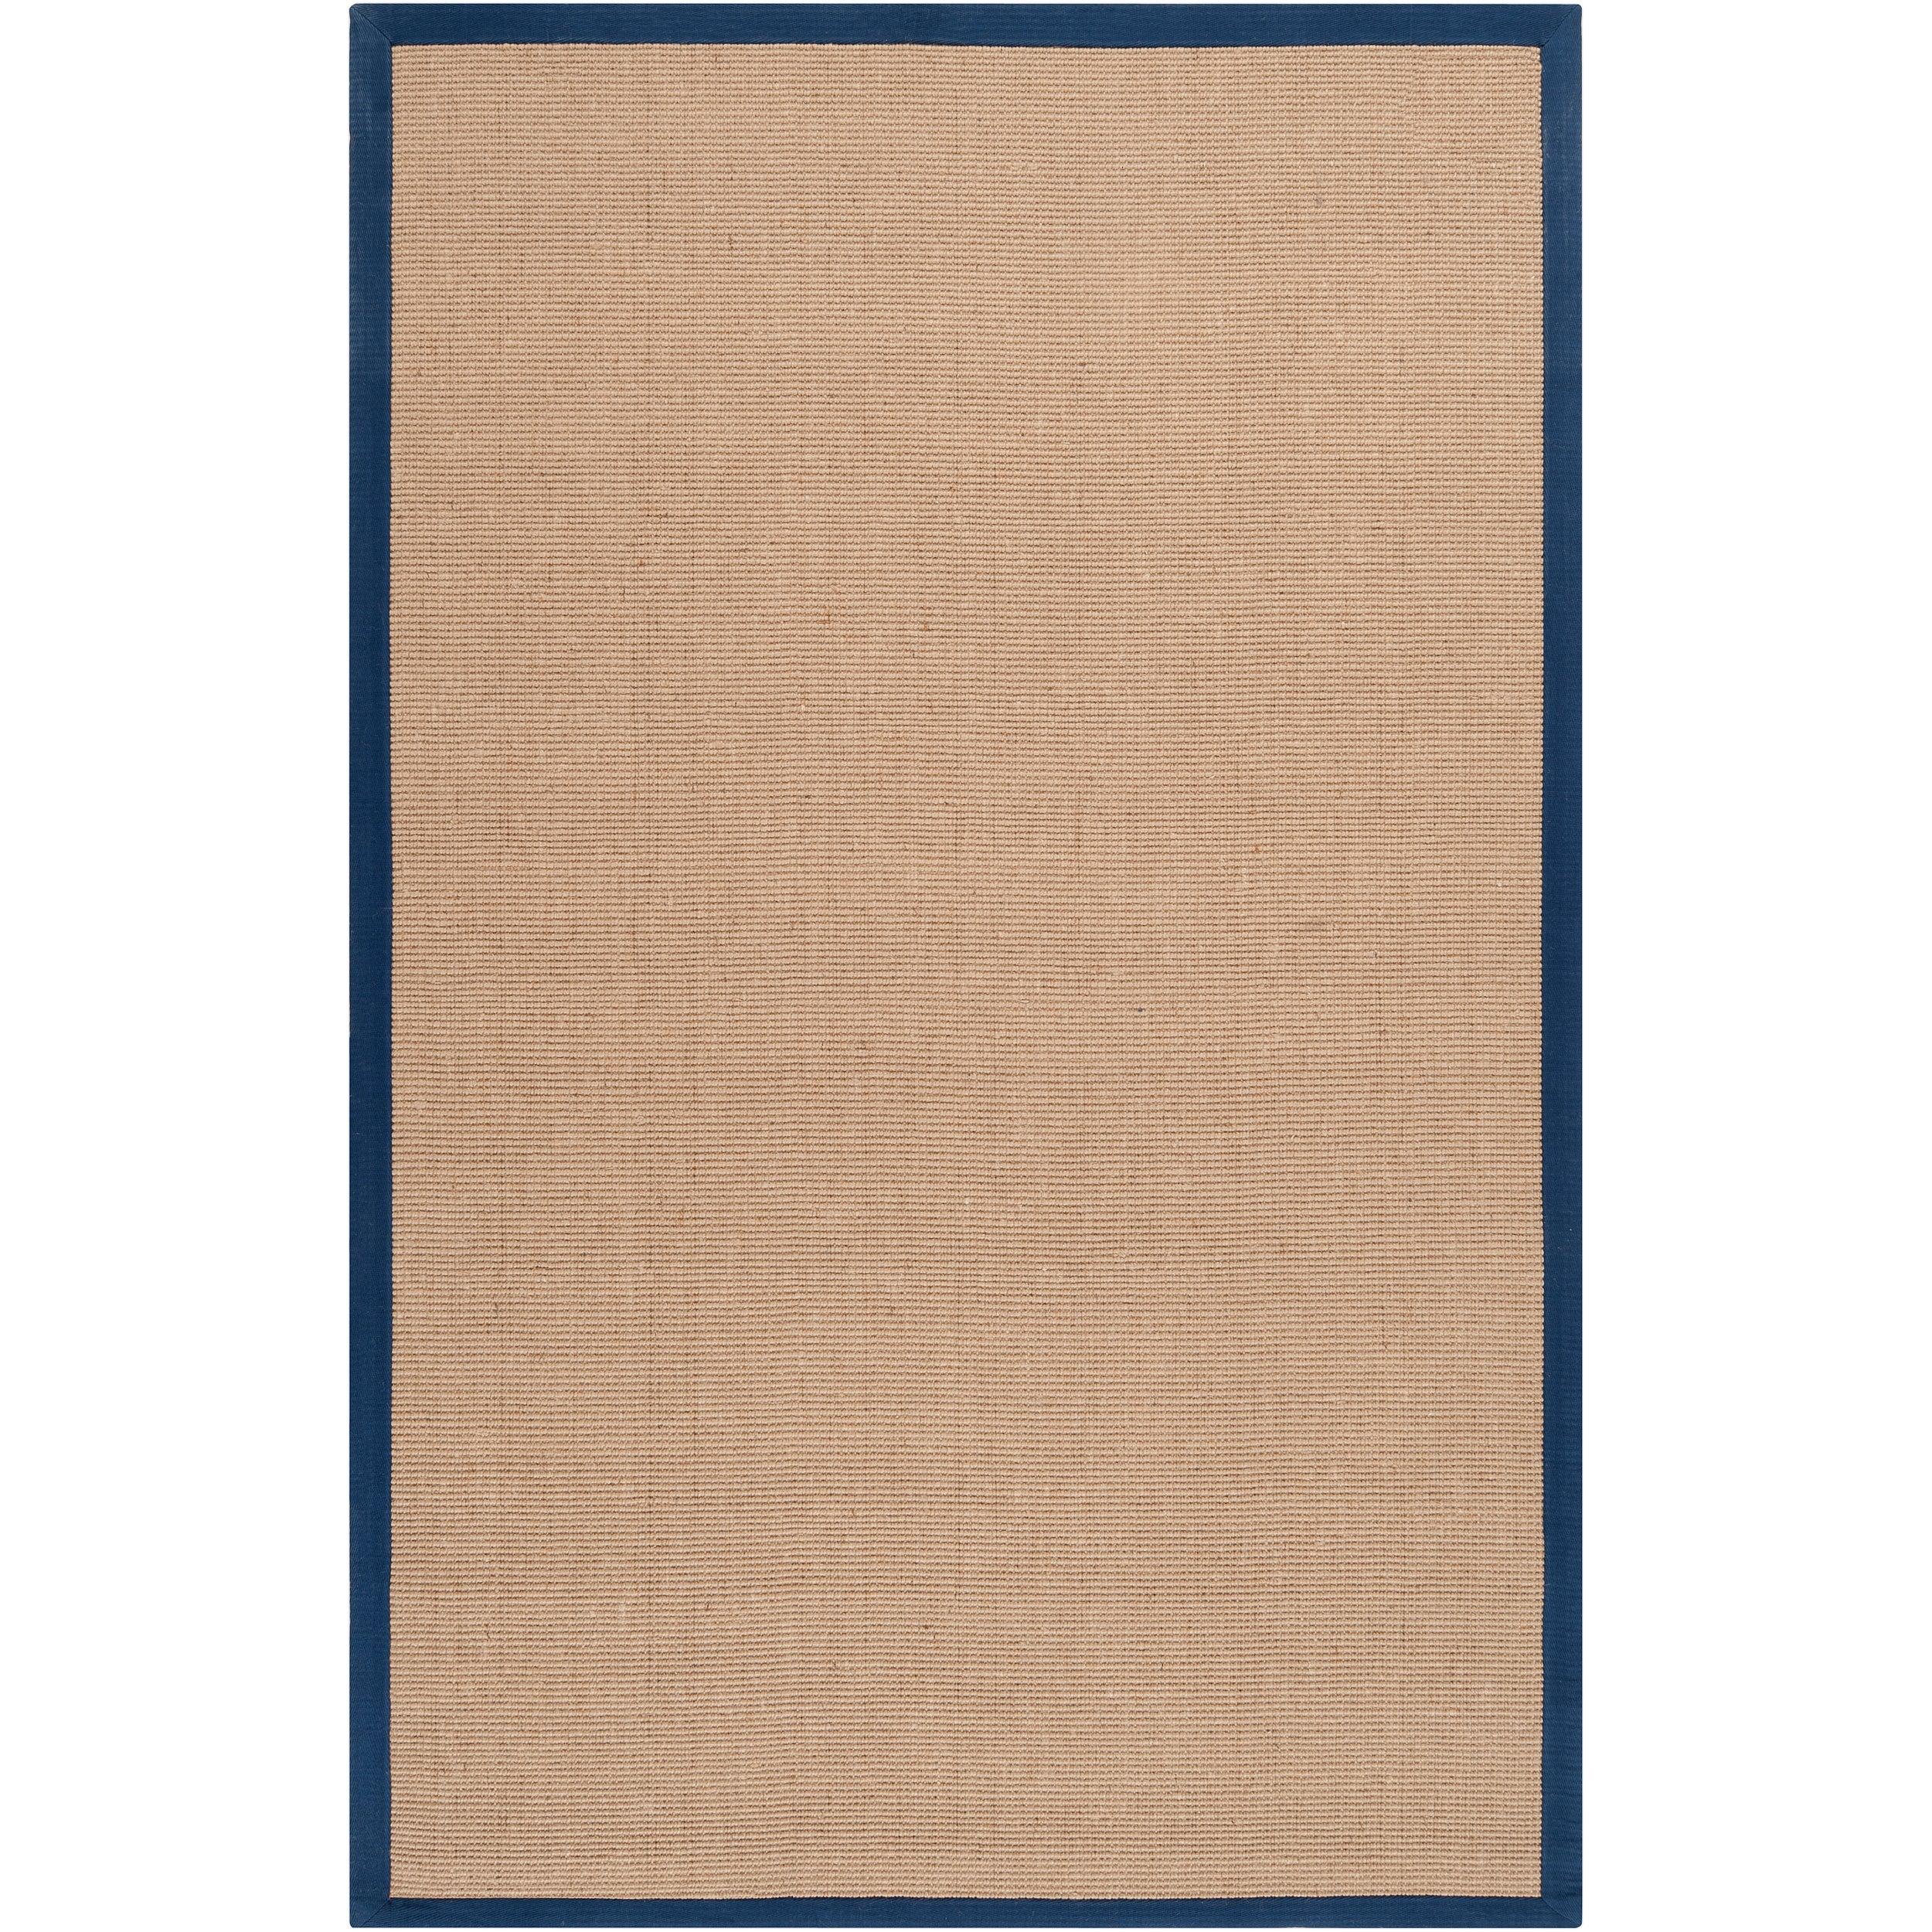 Hand-woven Navy Sophie B Natural Fiber Jute Area Rug (5' x 8')